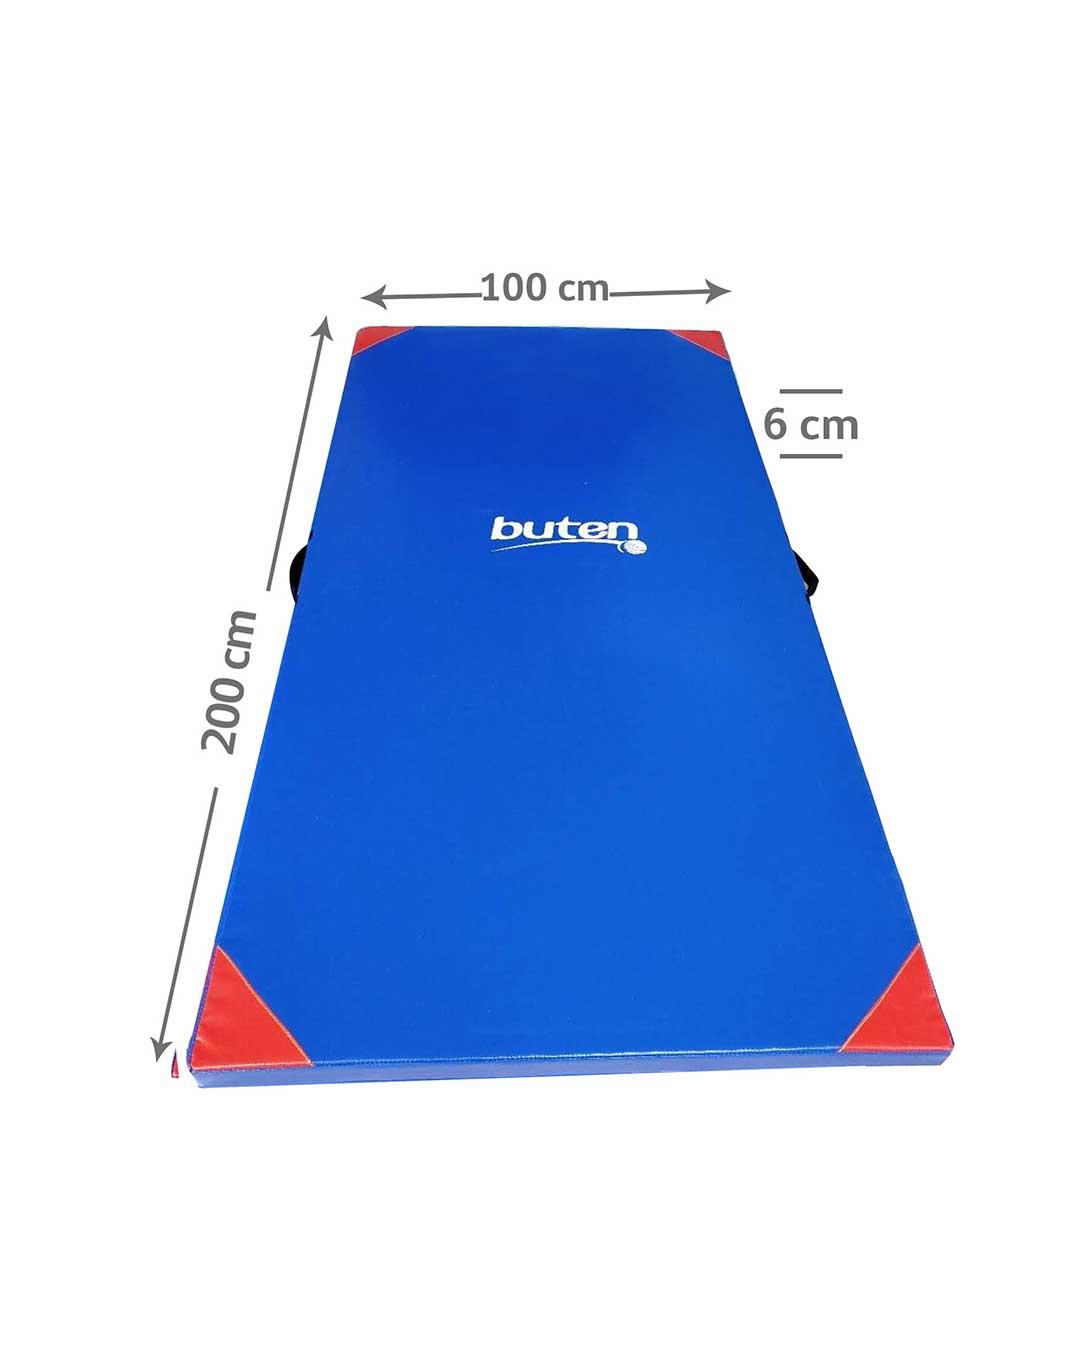 Colchoneta deportiva (200x100x6cm) marca BUTEN - XPRO200 - Chile